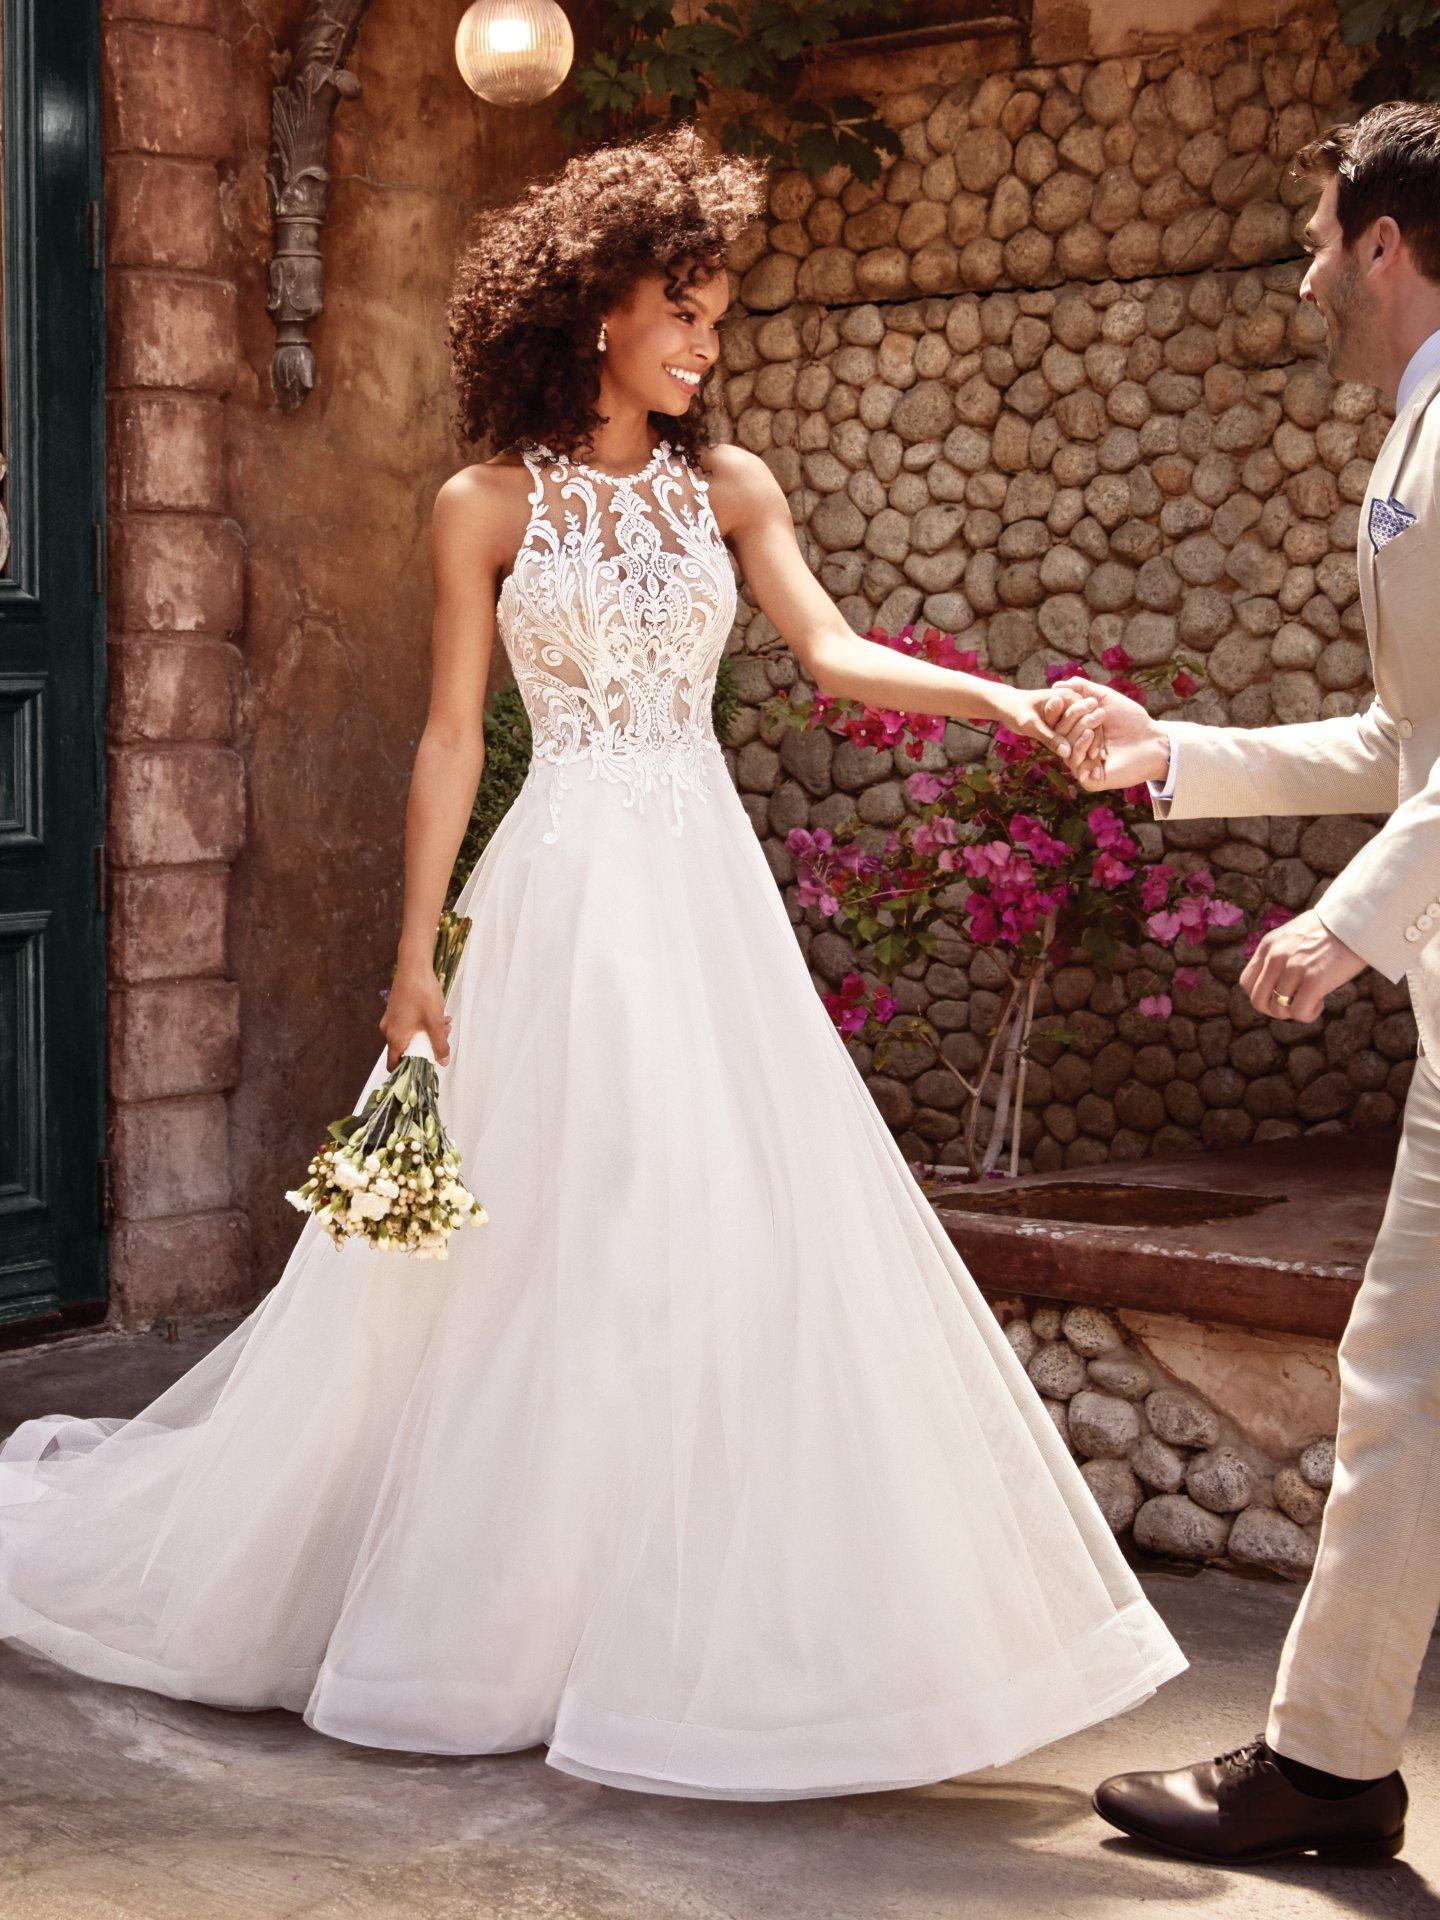 Find Your Wedding Dress Style Maggie Sottero Jolie Clothing Aftan Rebecca Ingram Ardelle 9rs064 Promo1